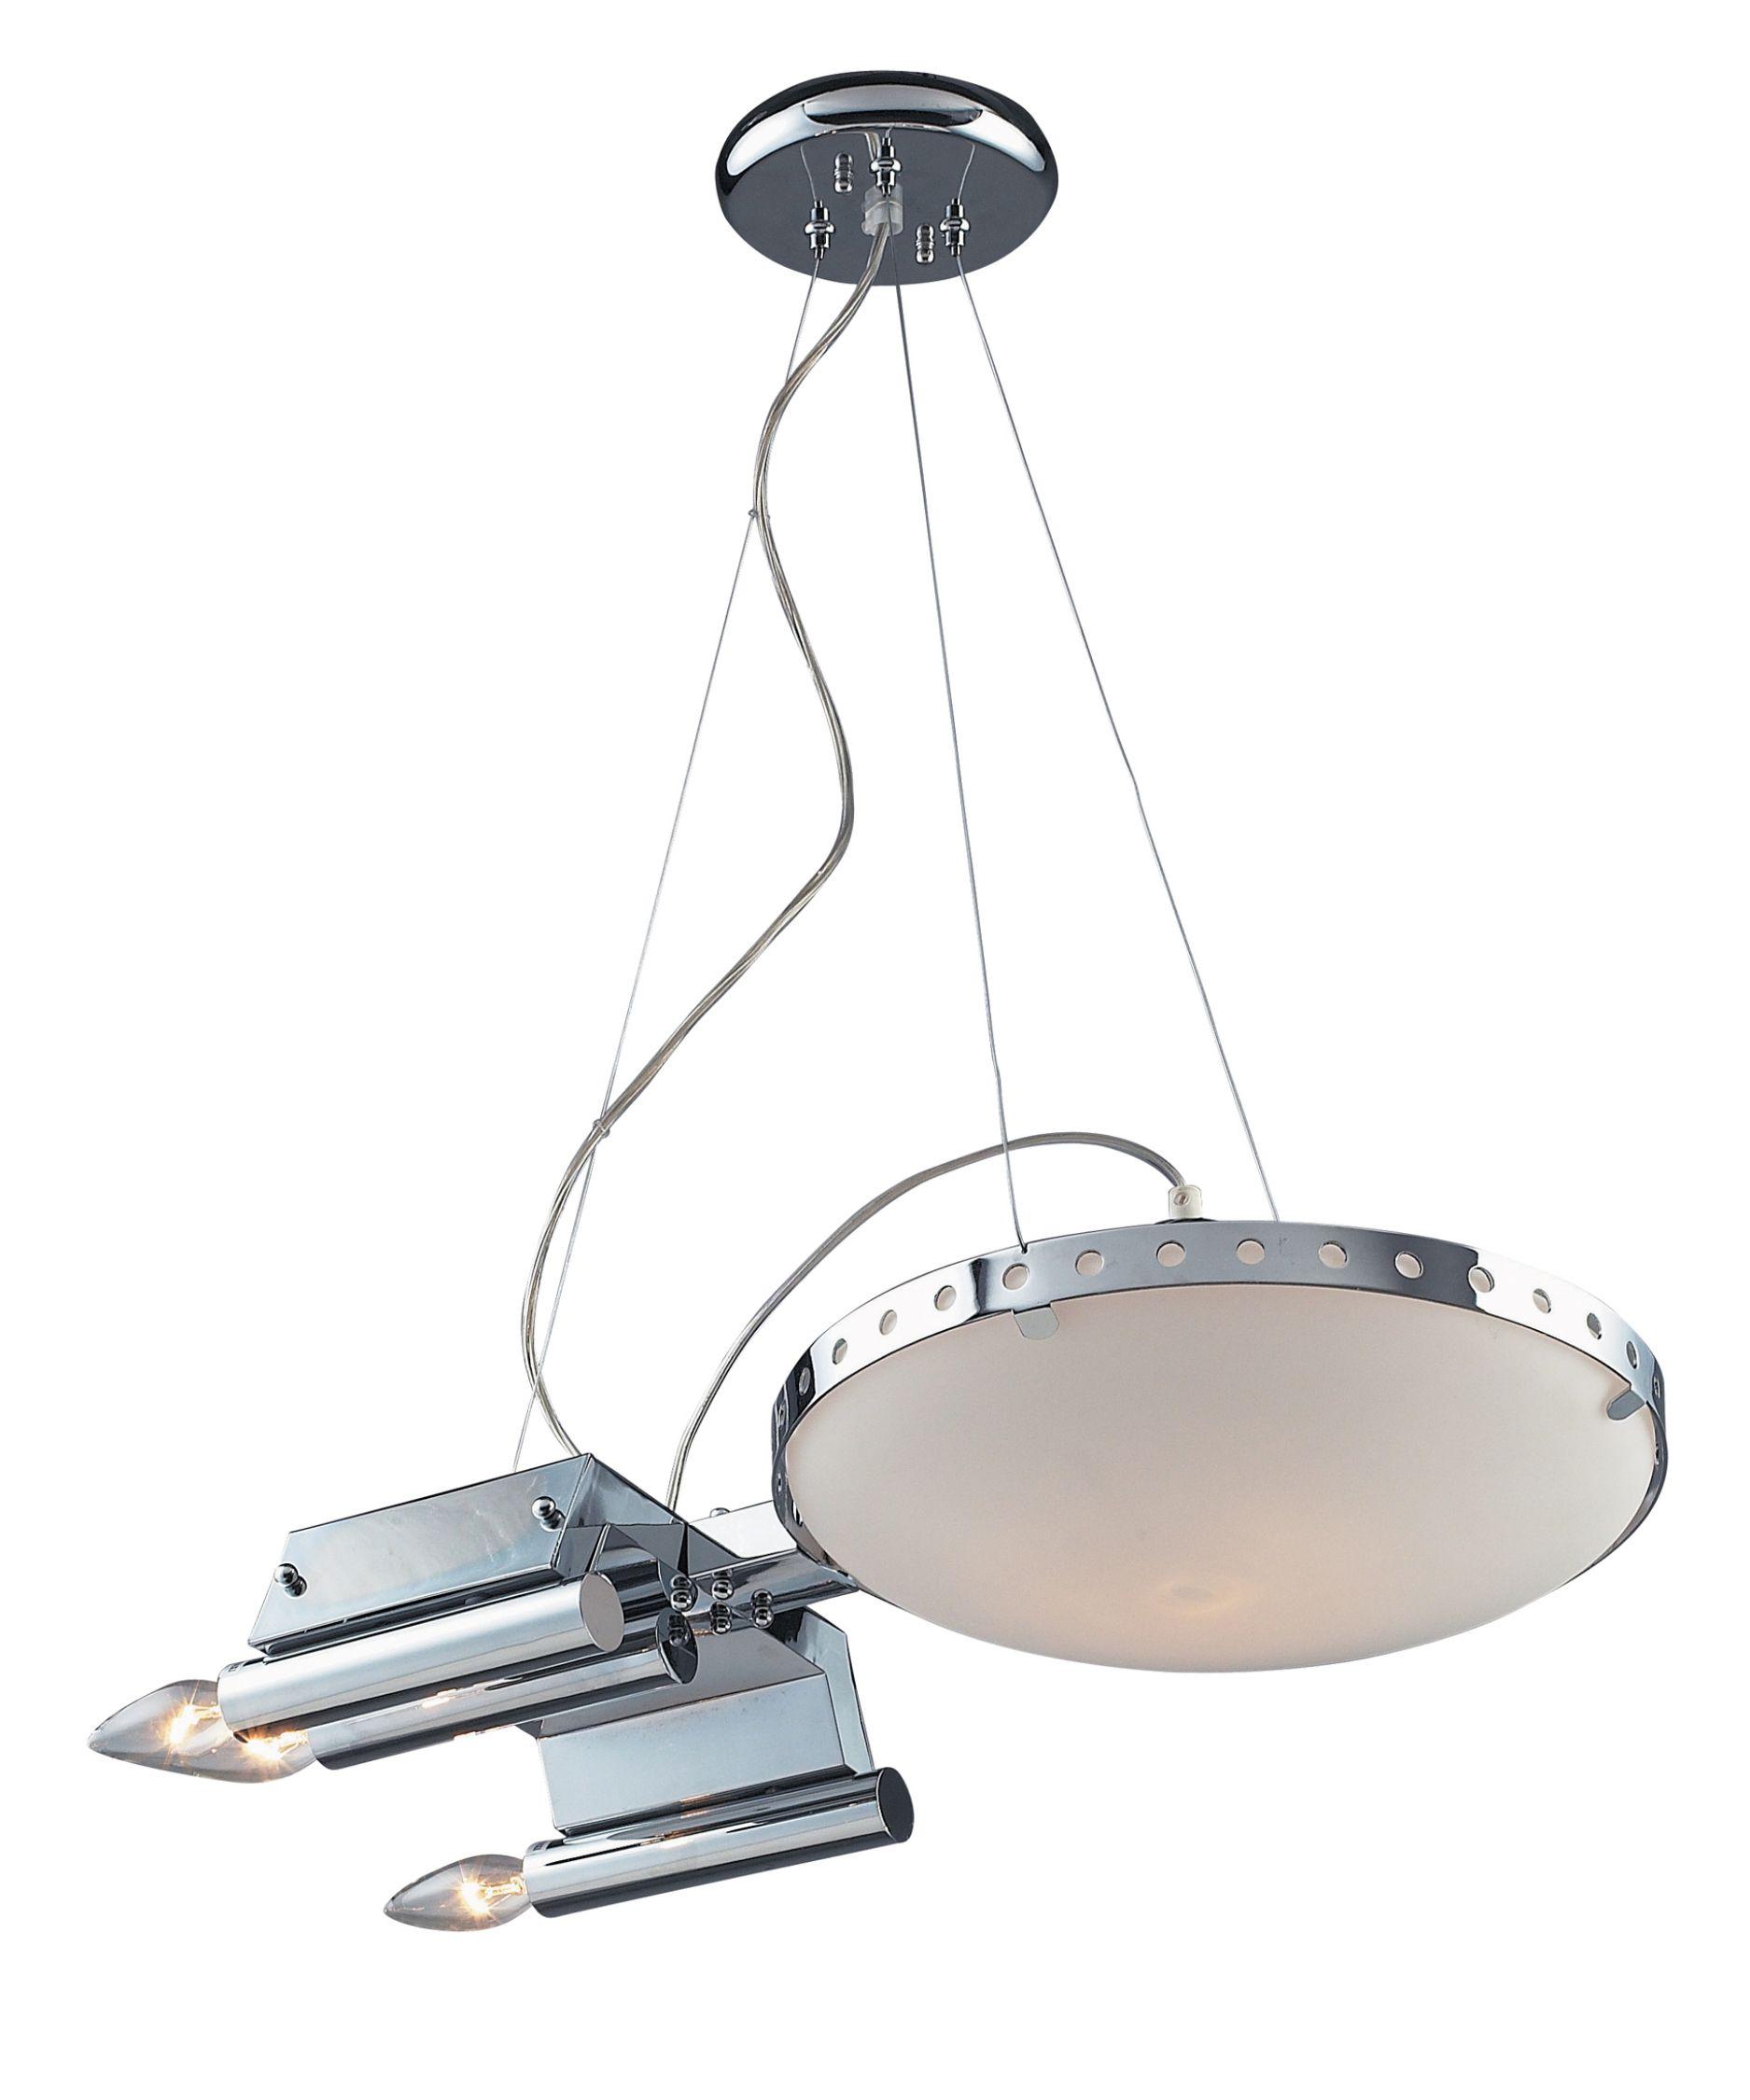 elk lighting starship 26 inch wide 4 light large pendant | fun